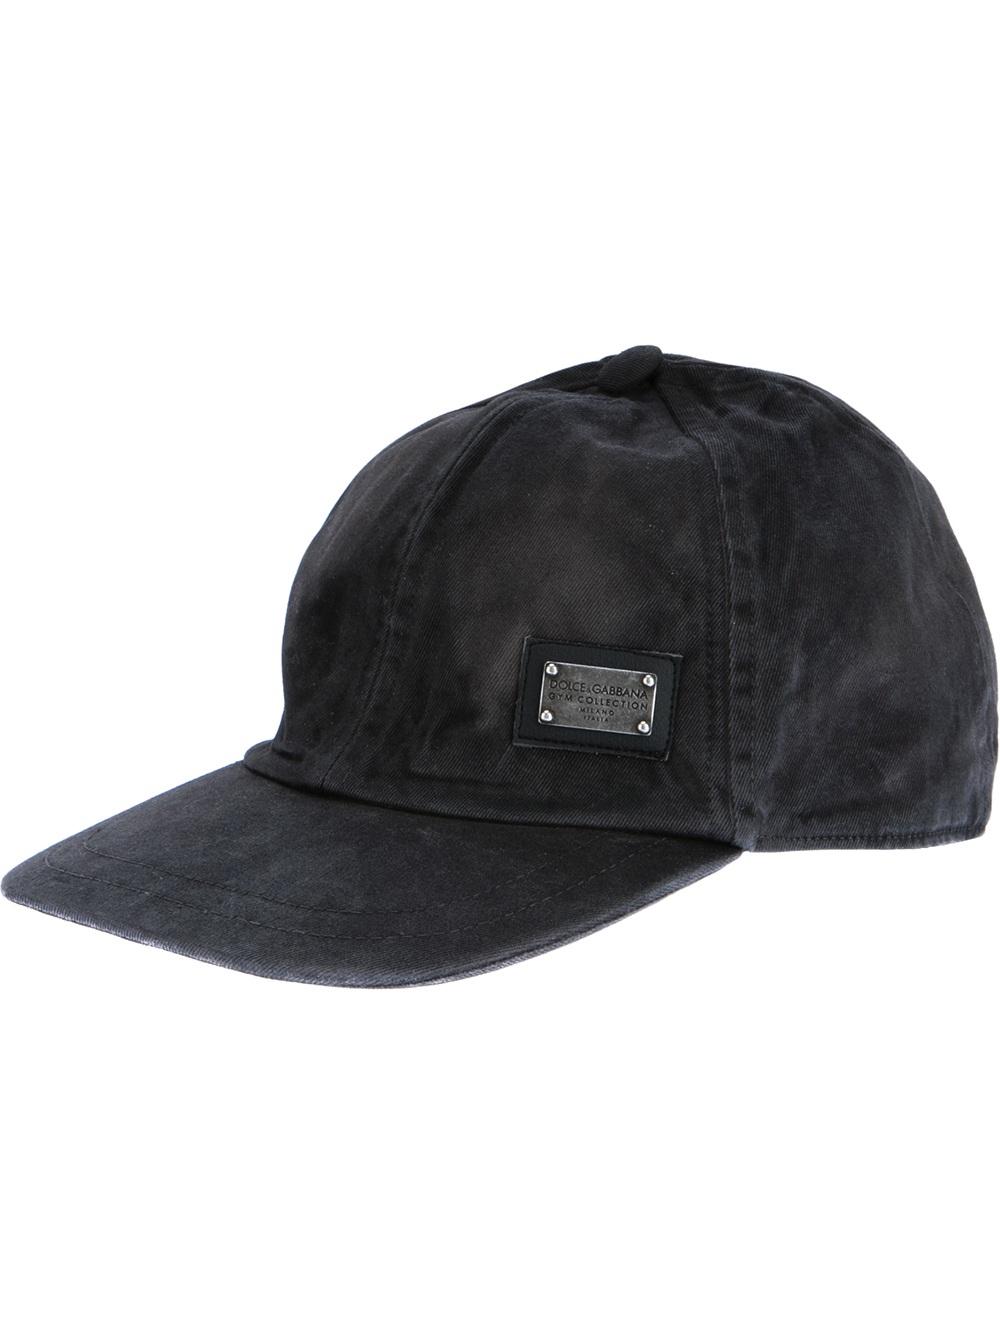 Lyst - Dolce   Gabbana Baseball Cap in Black for Men b5b697ac47b